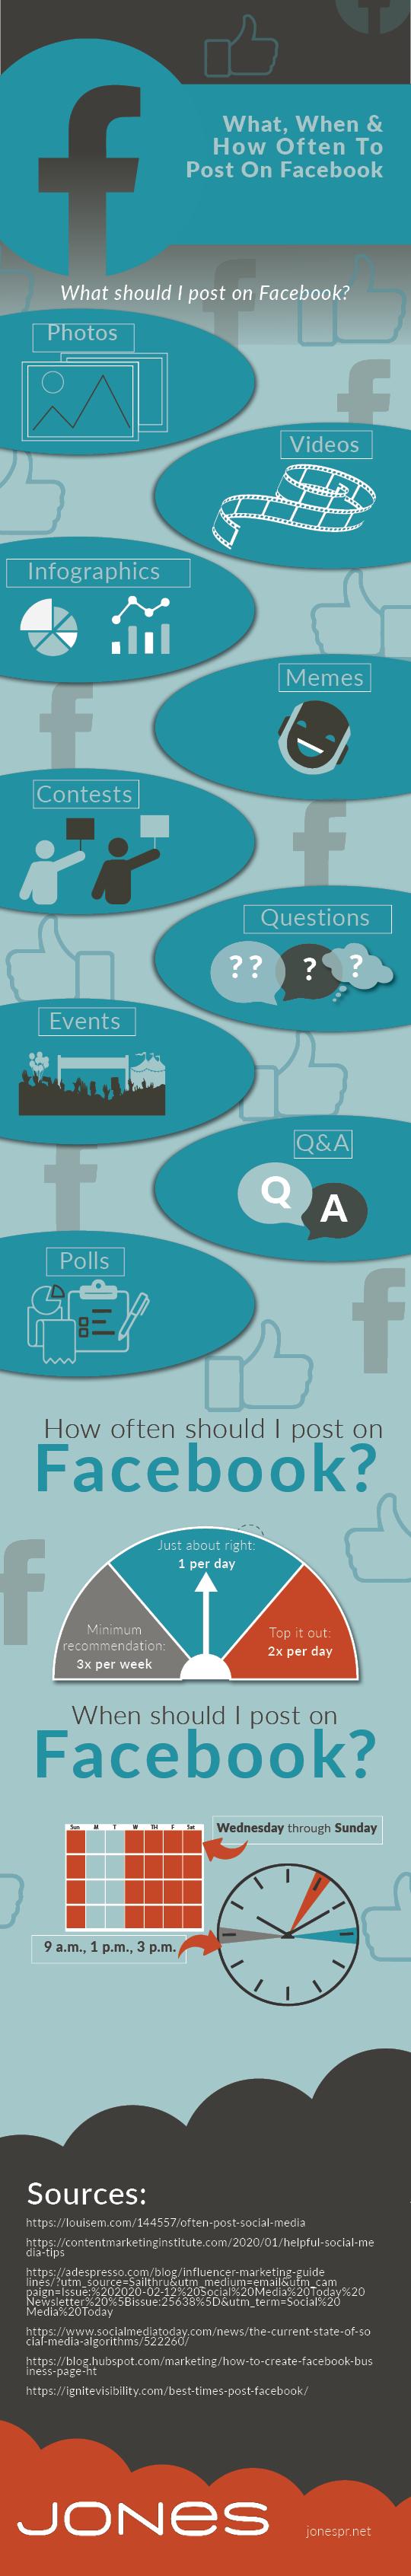 jones_complete_social_media_guide_facebook